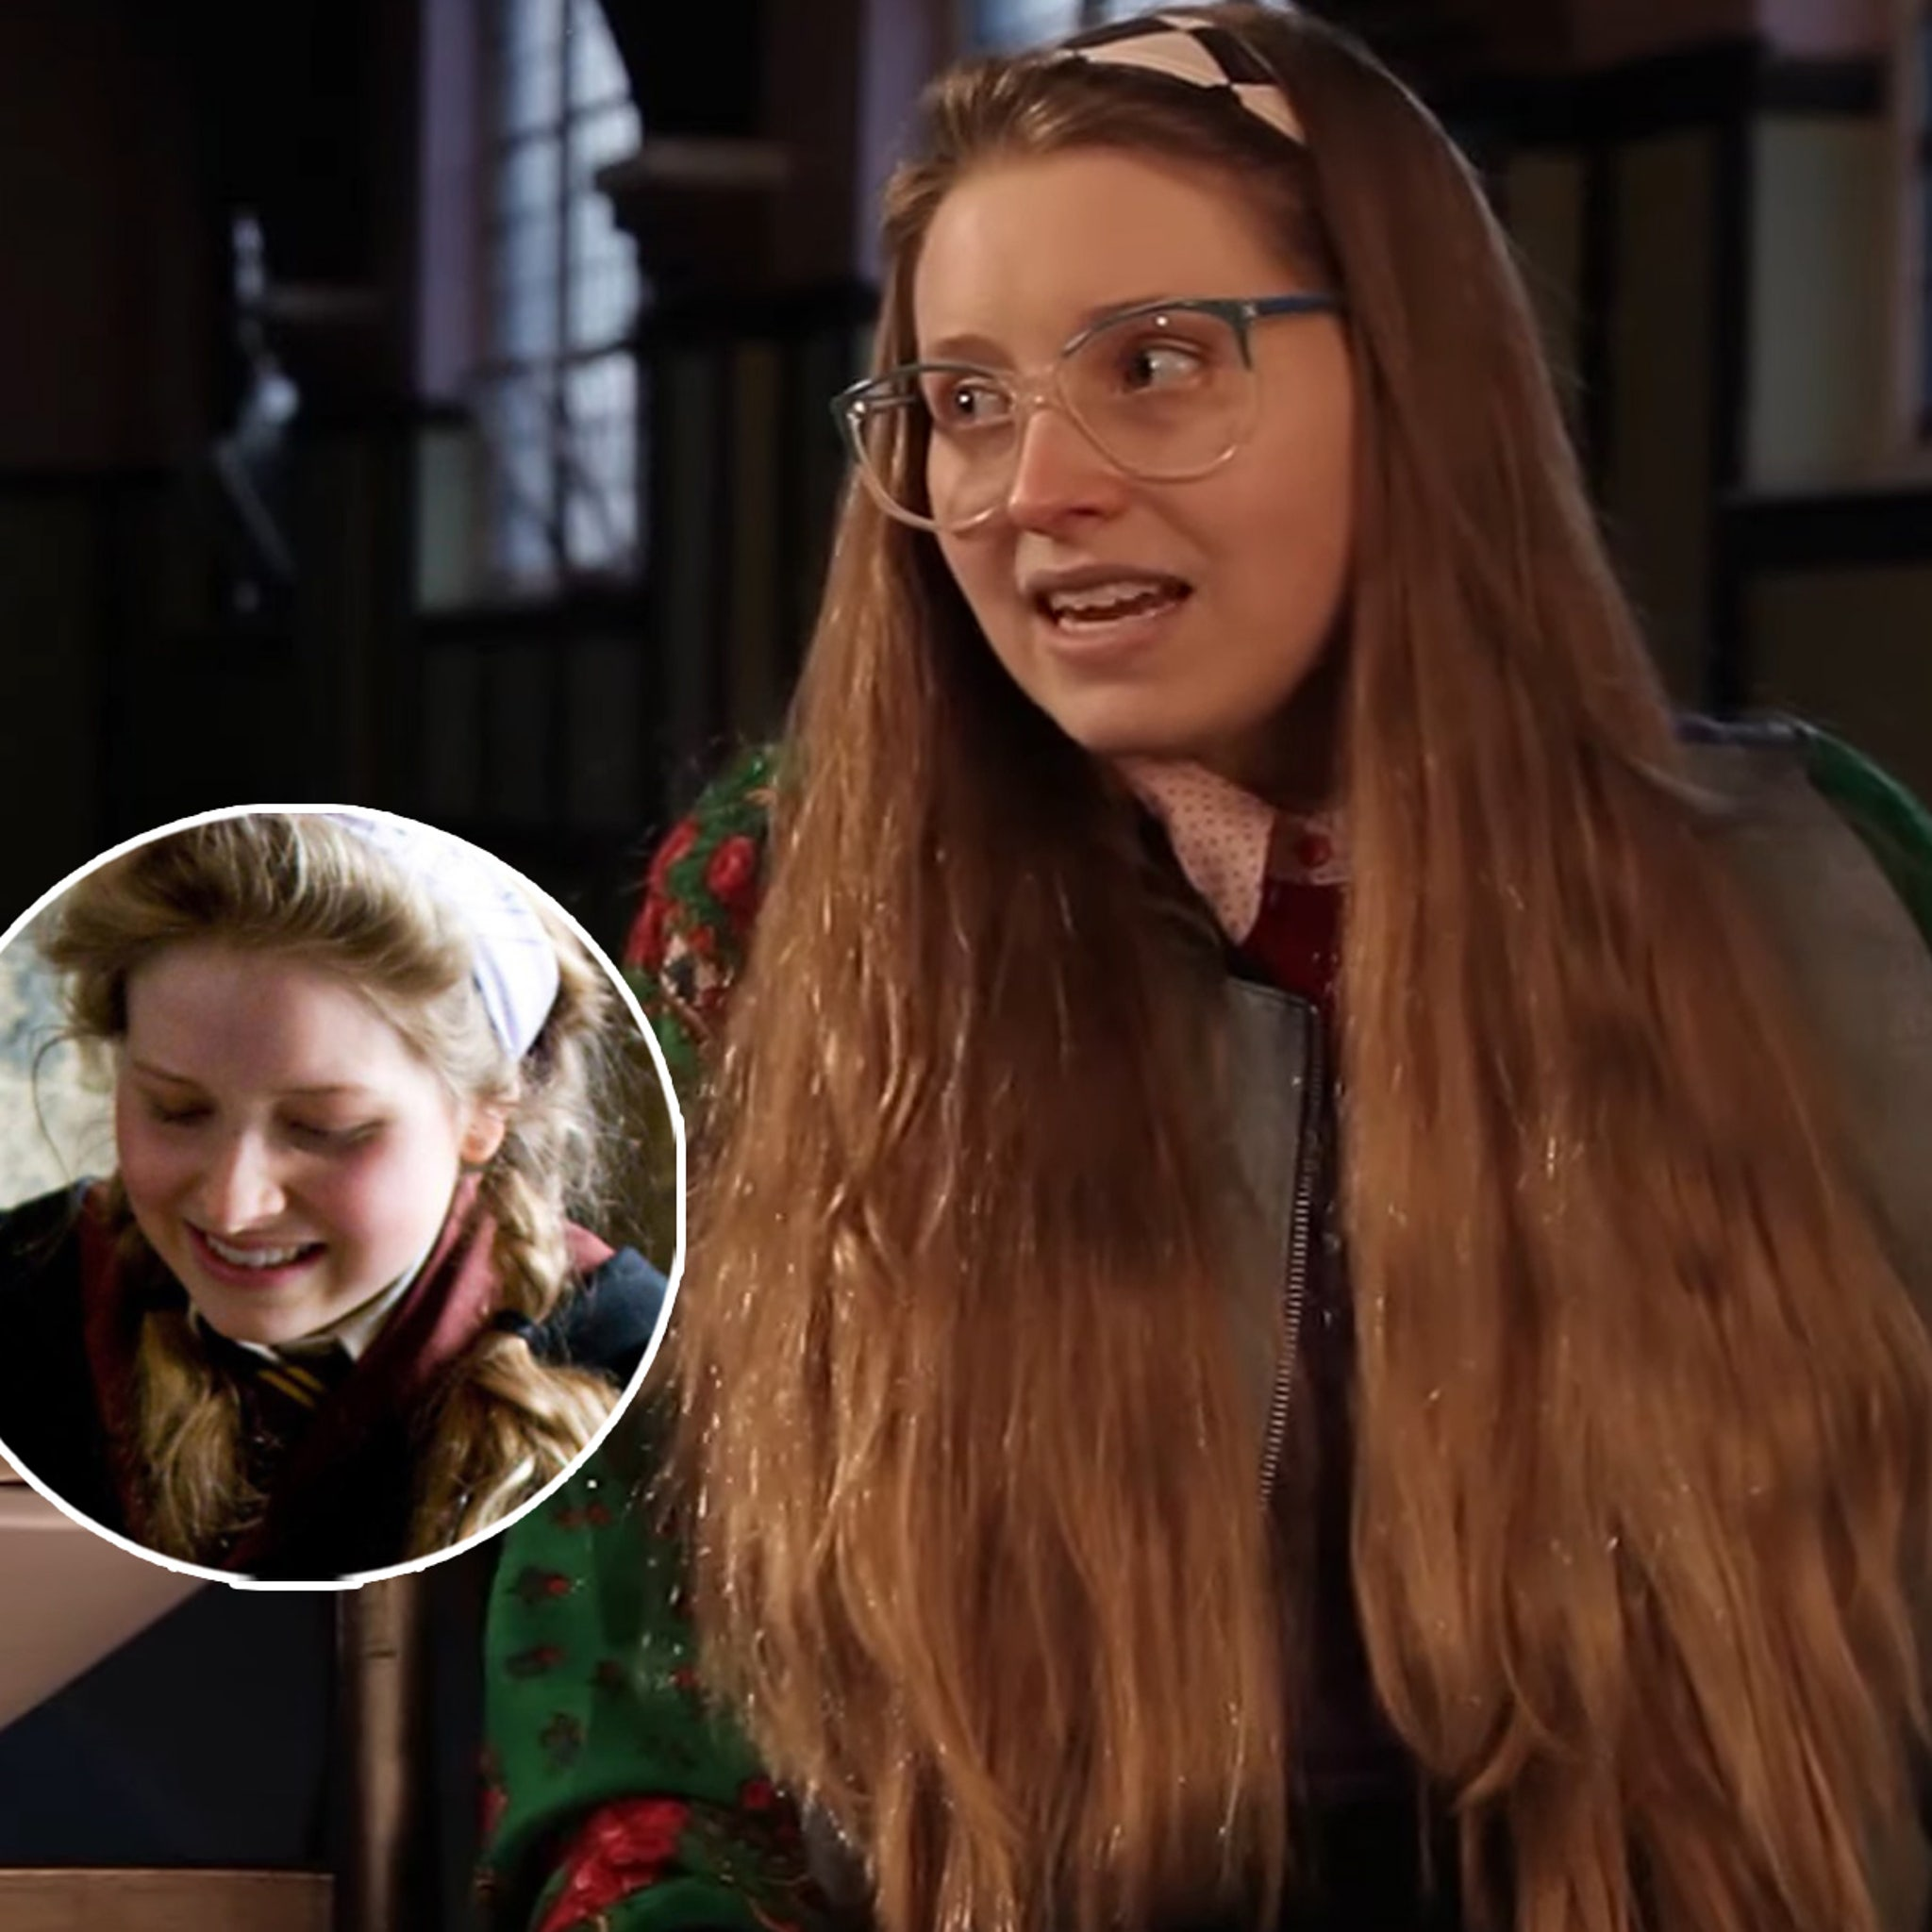 Harry Potter actress Jessie Cave details terrifying